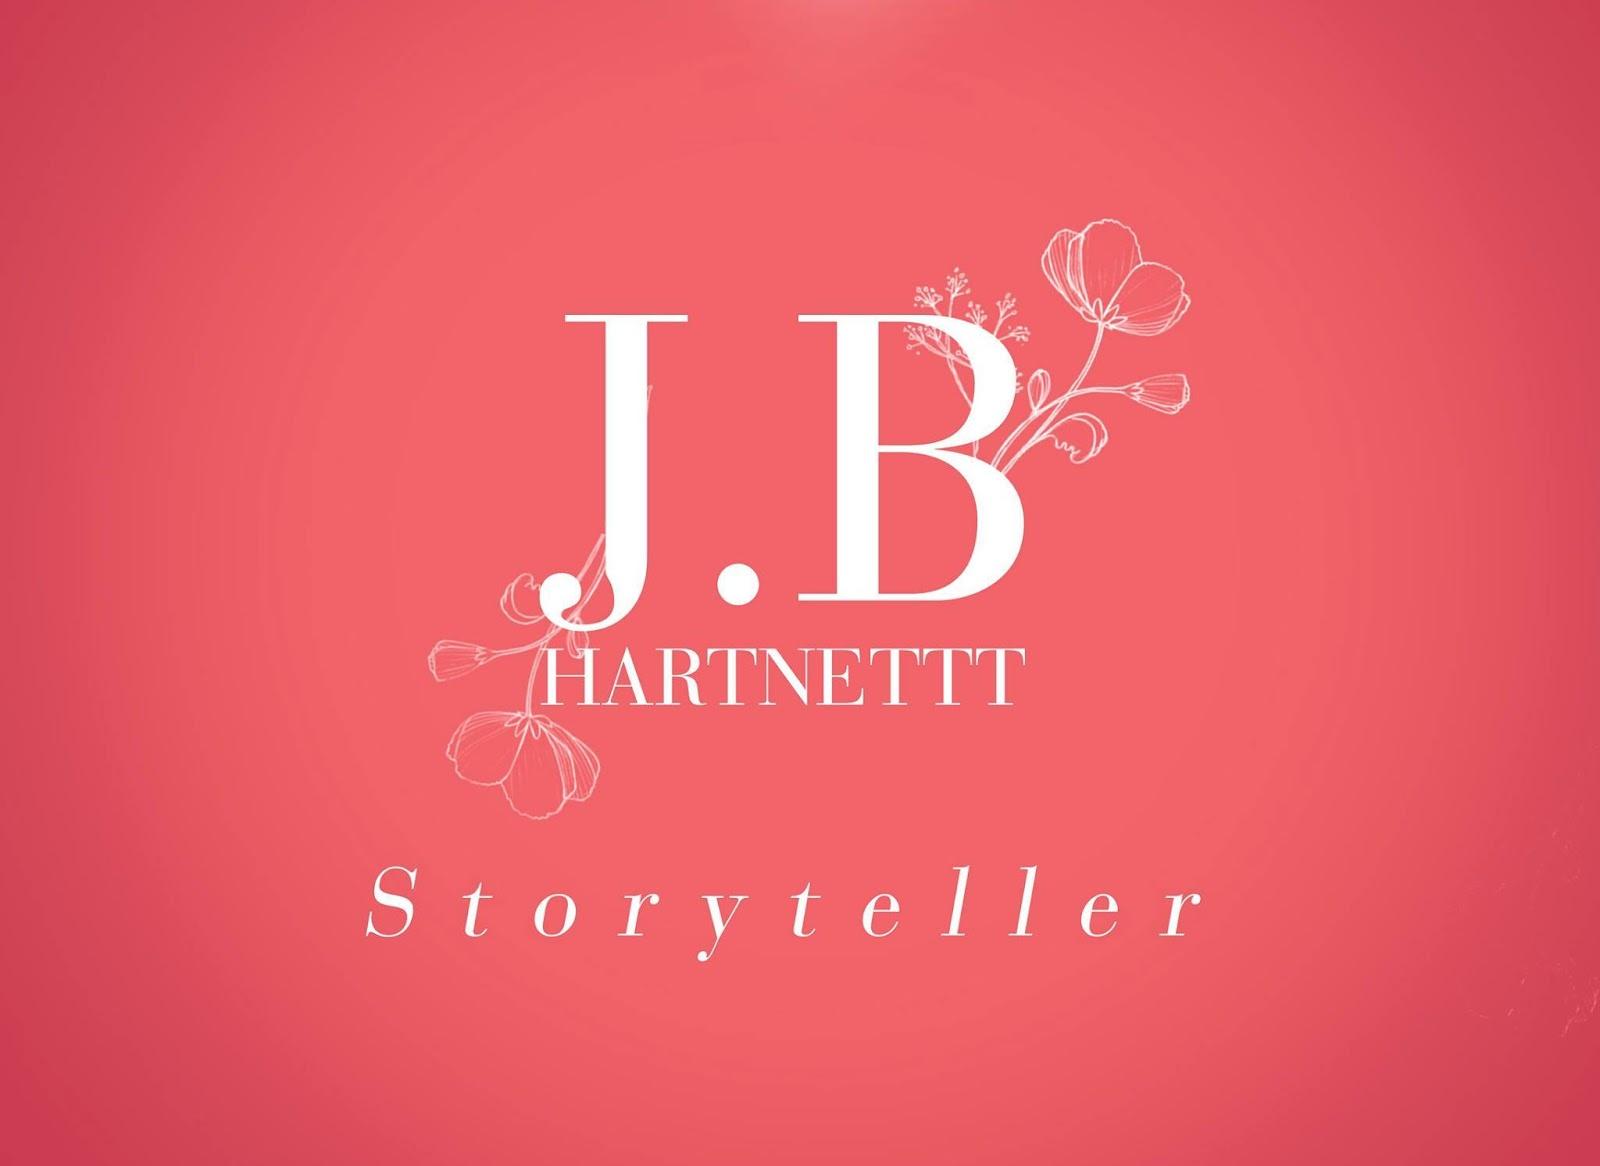 j.b. hartnett bio.jpg